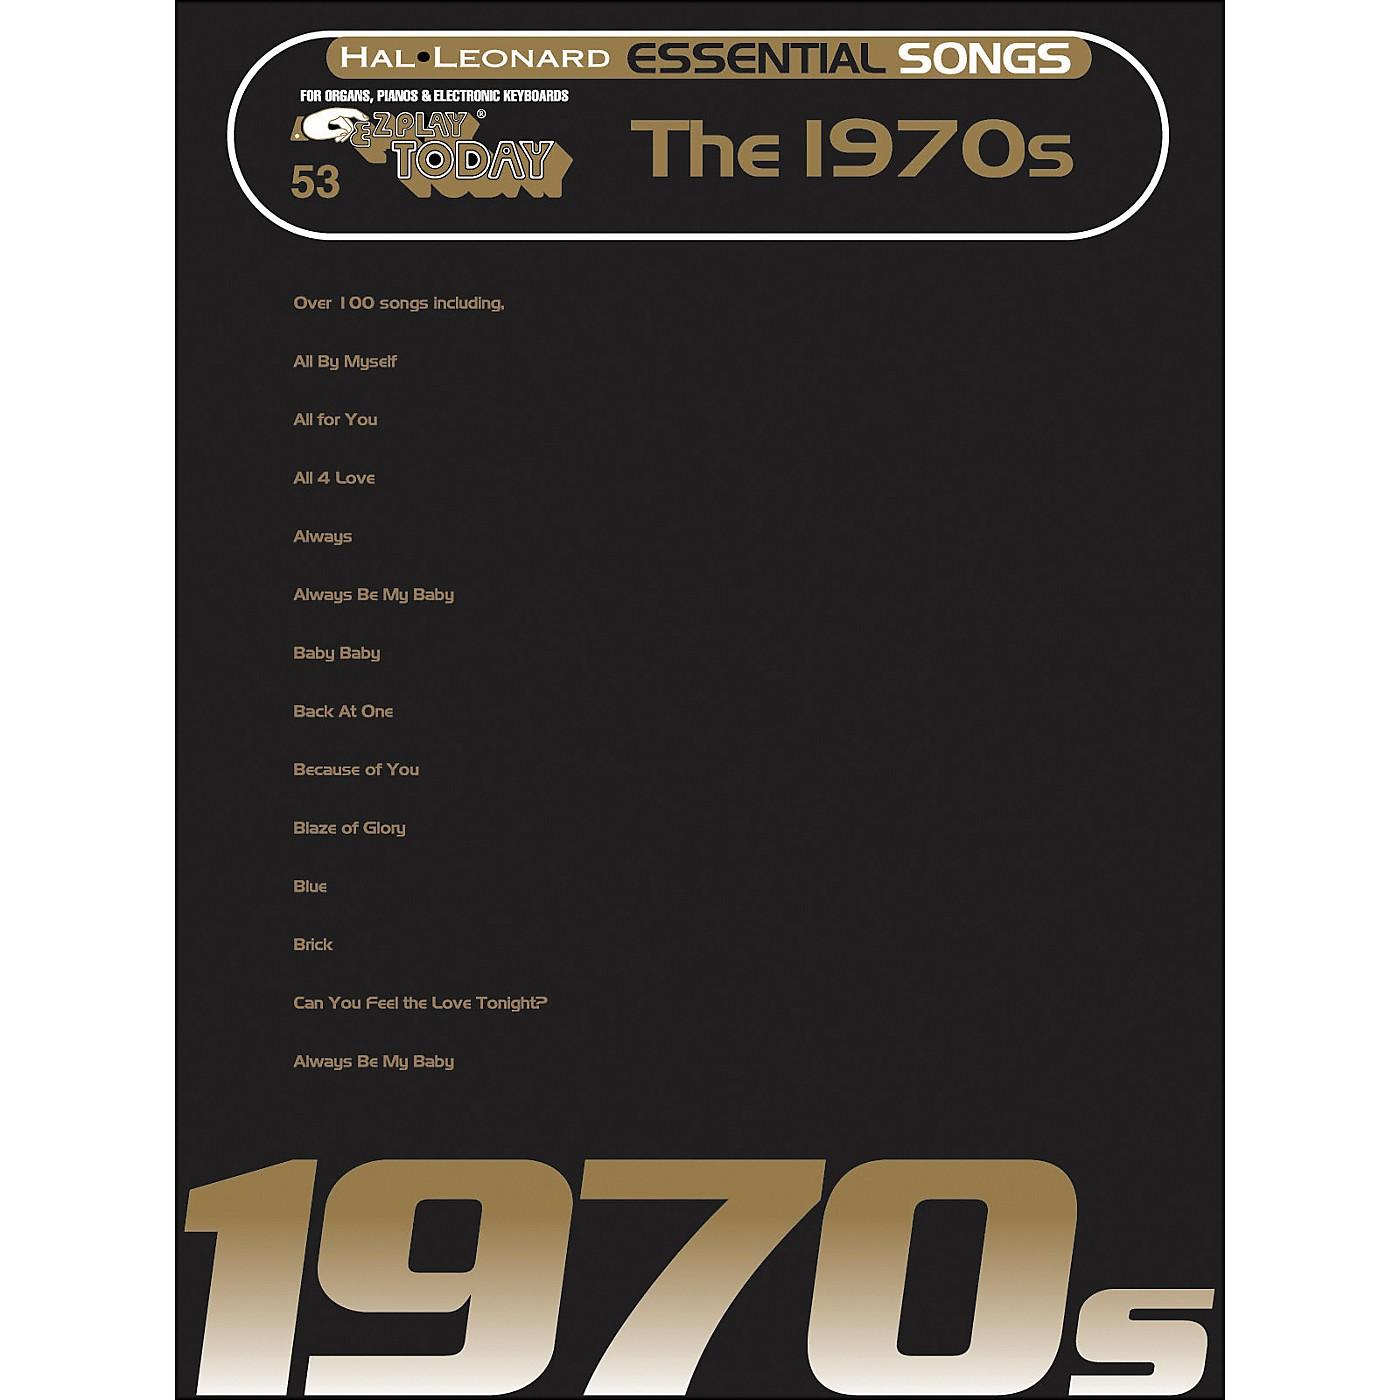 Hal Leonard Essential Songs - The 1970's E-Z Play 53 thumbnail